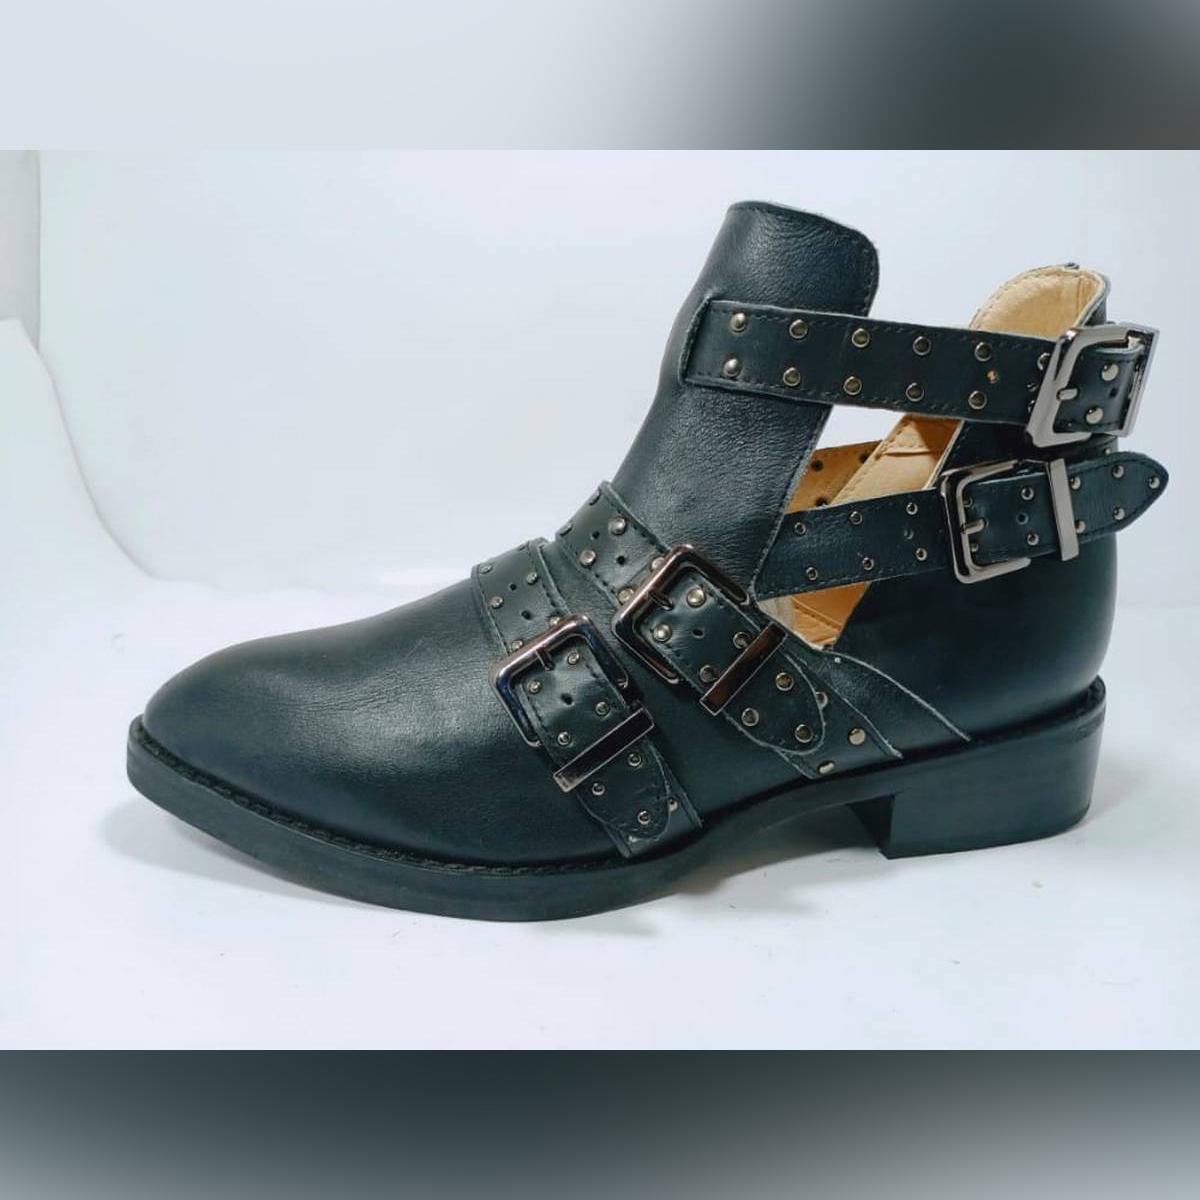 37 size flat stylish design boots